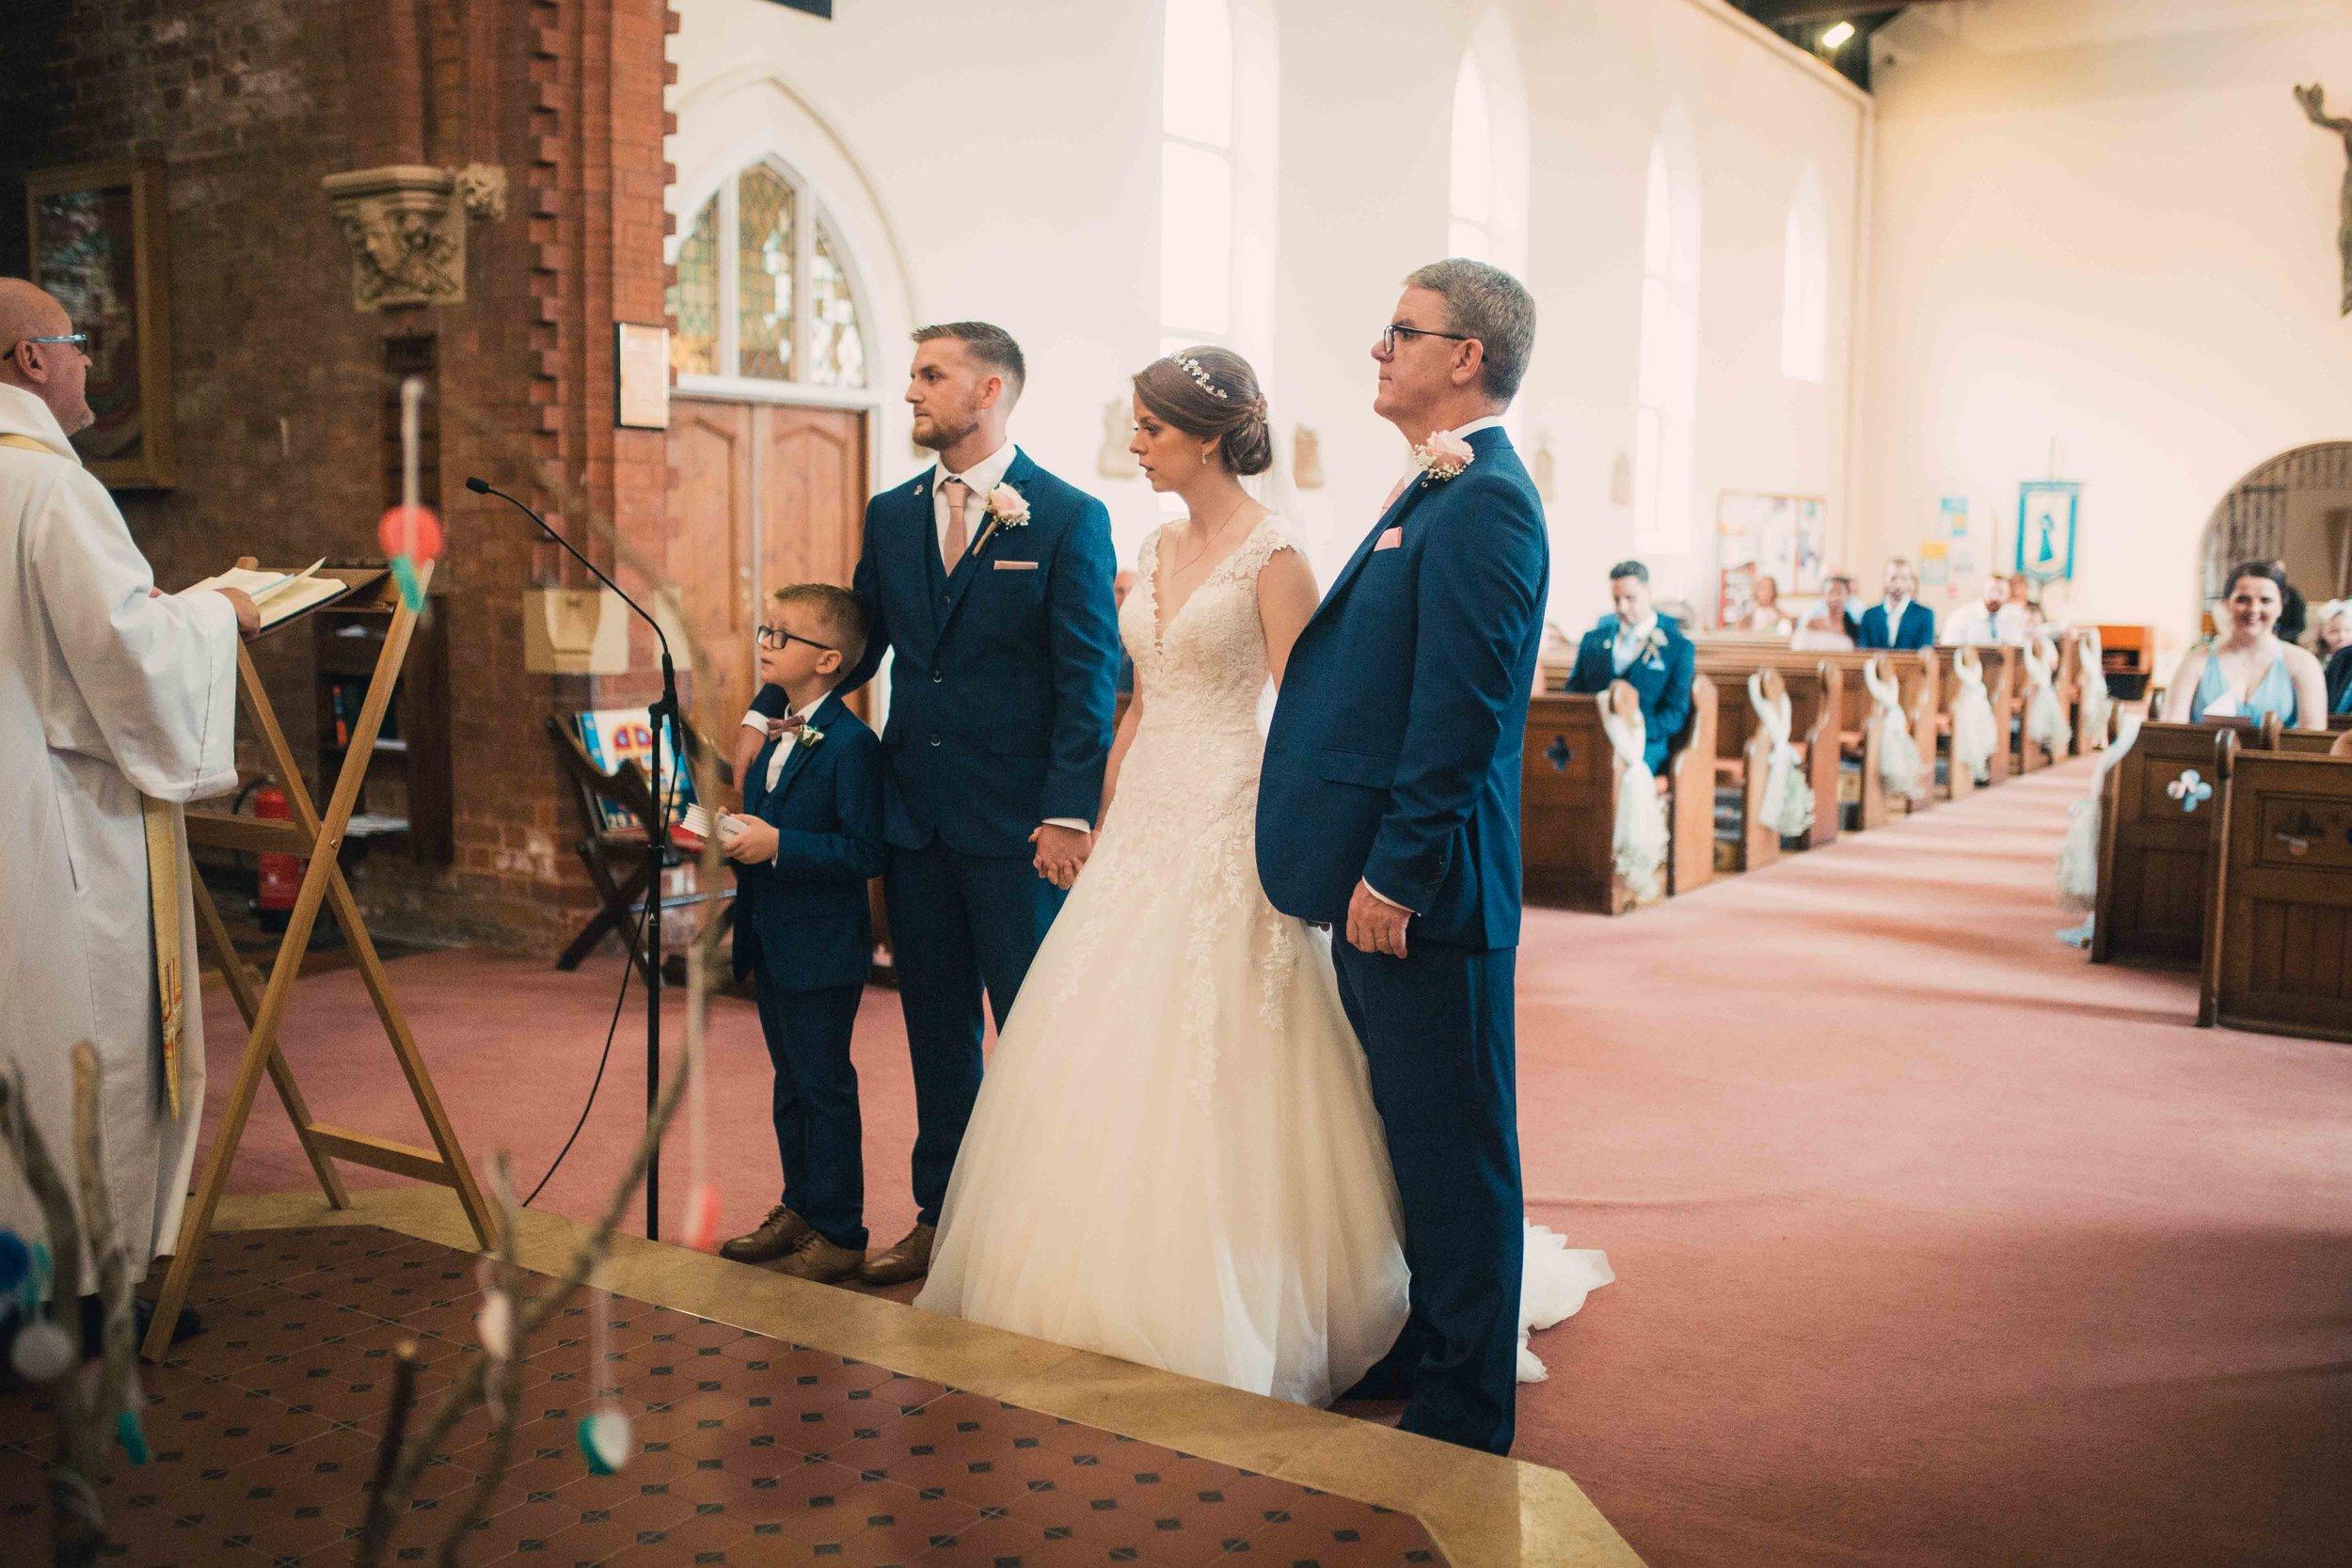 Lea-cooper-photography-willenhall-wolverhampton-wedding-photographer-birmingham-shirley-west-midlands-ceremony-church-21.JPG